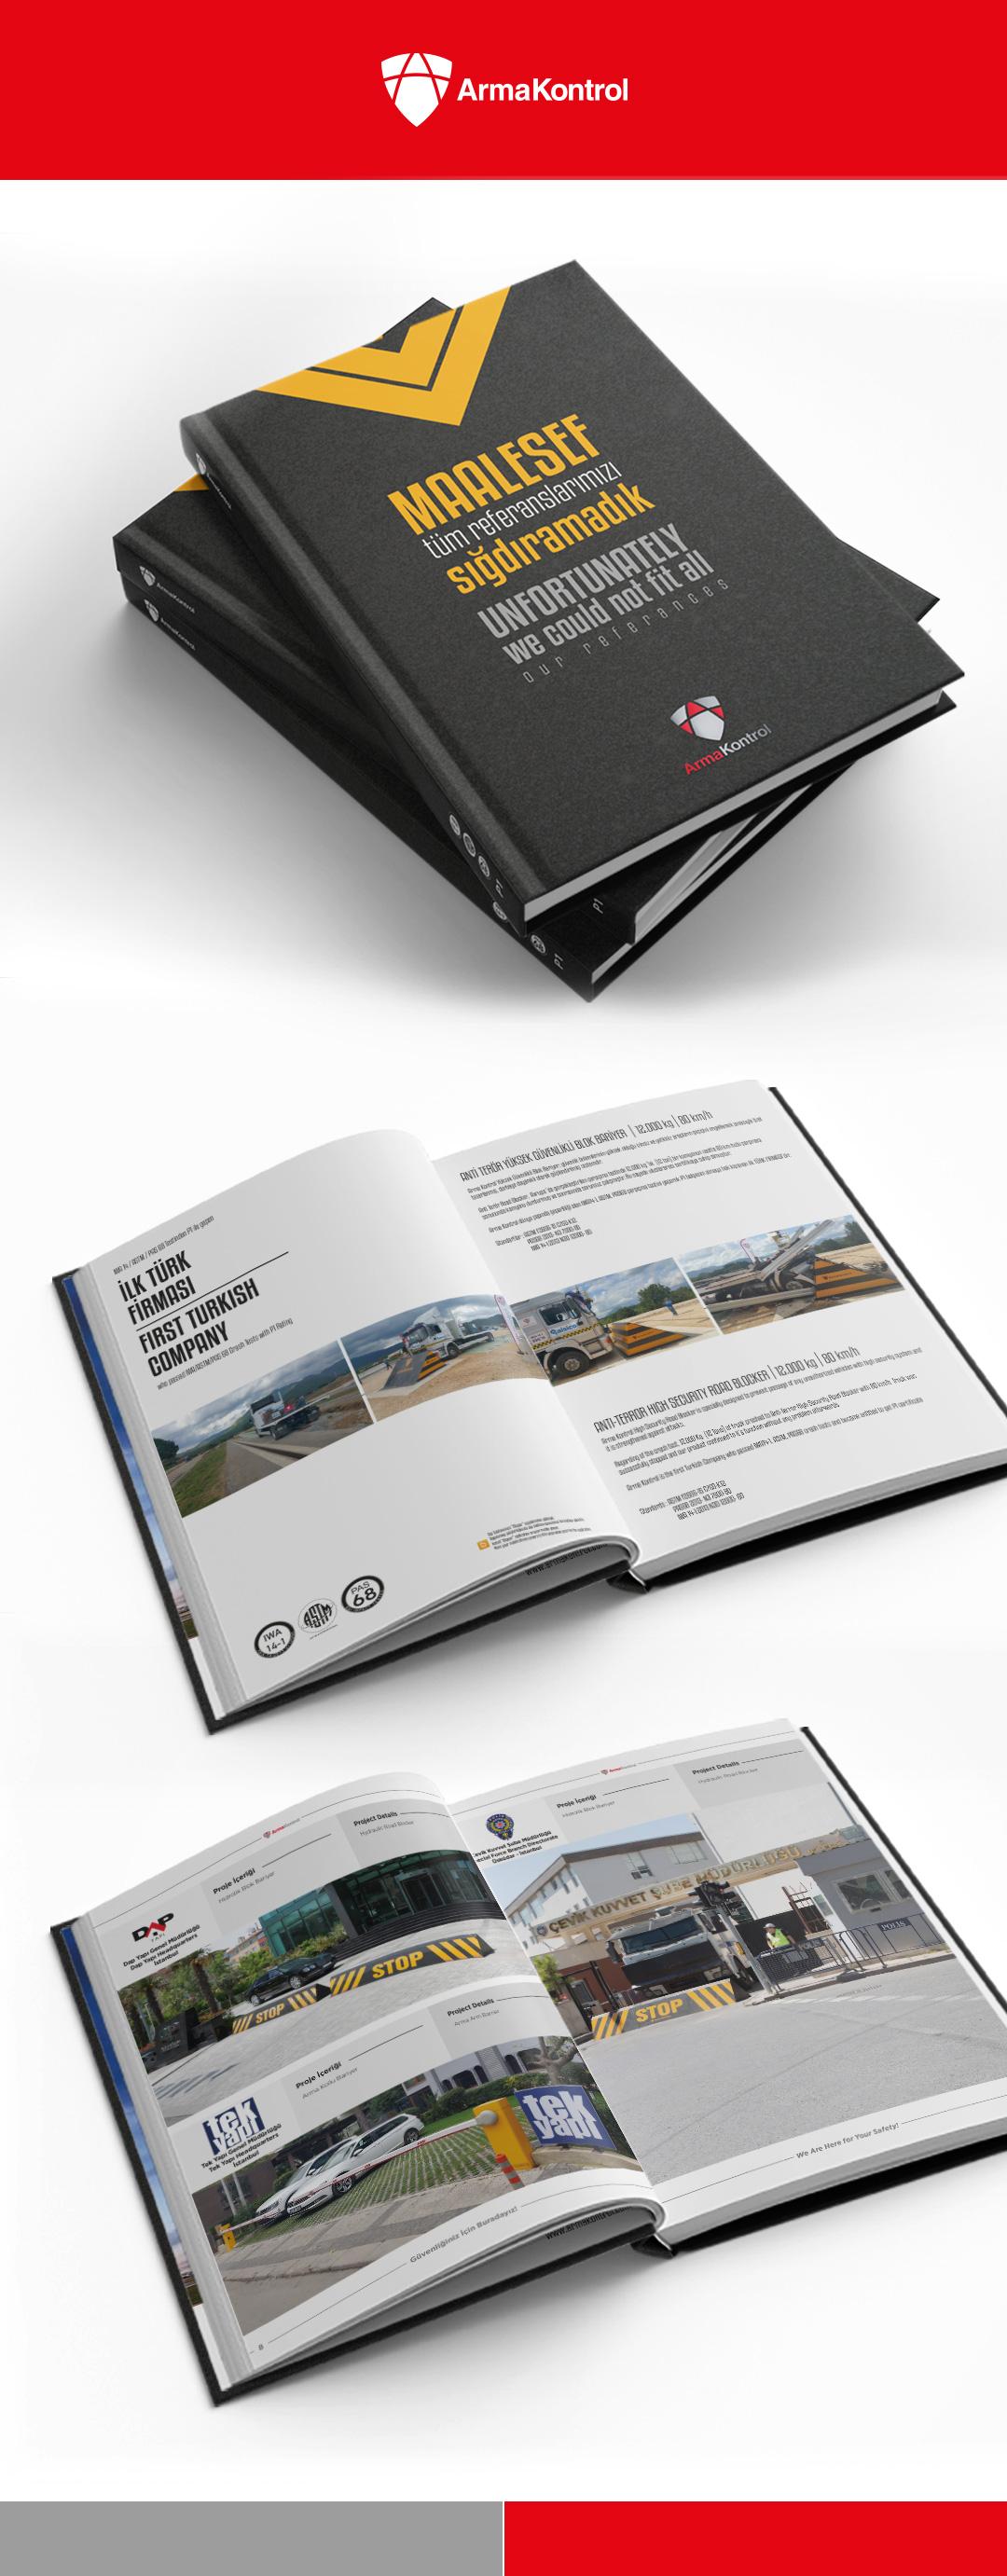 Arma Kontrol Referans kataloğu tasarımı